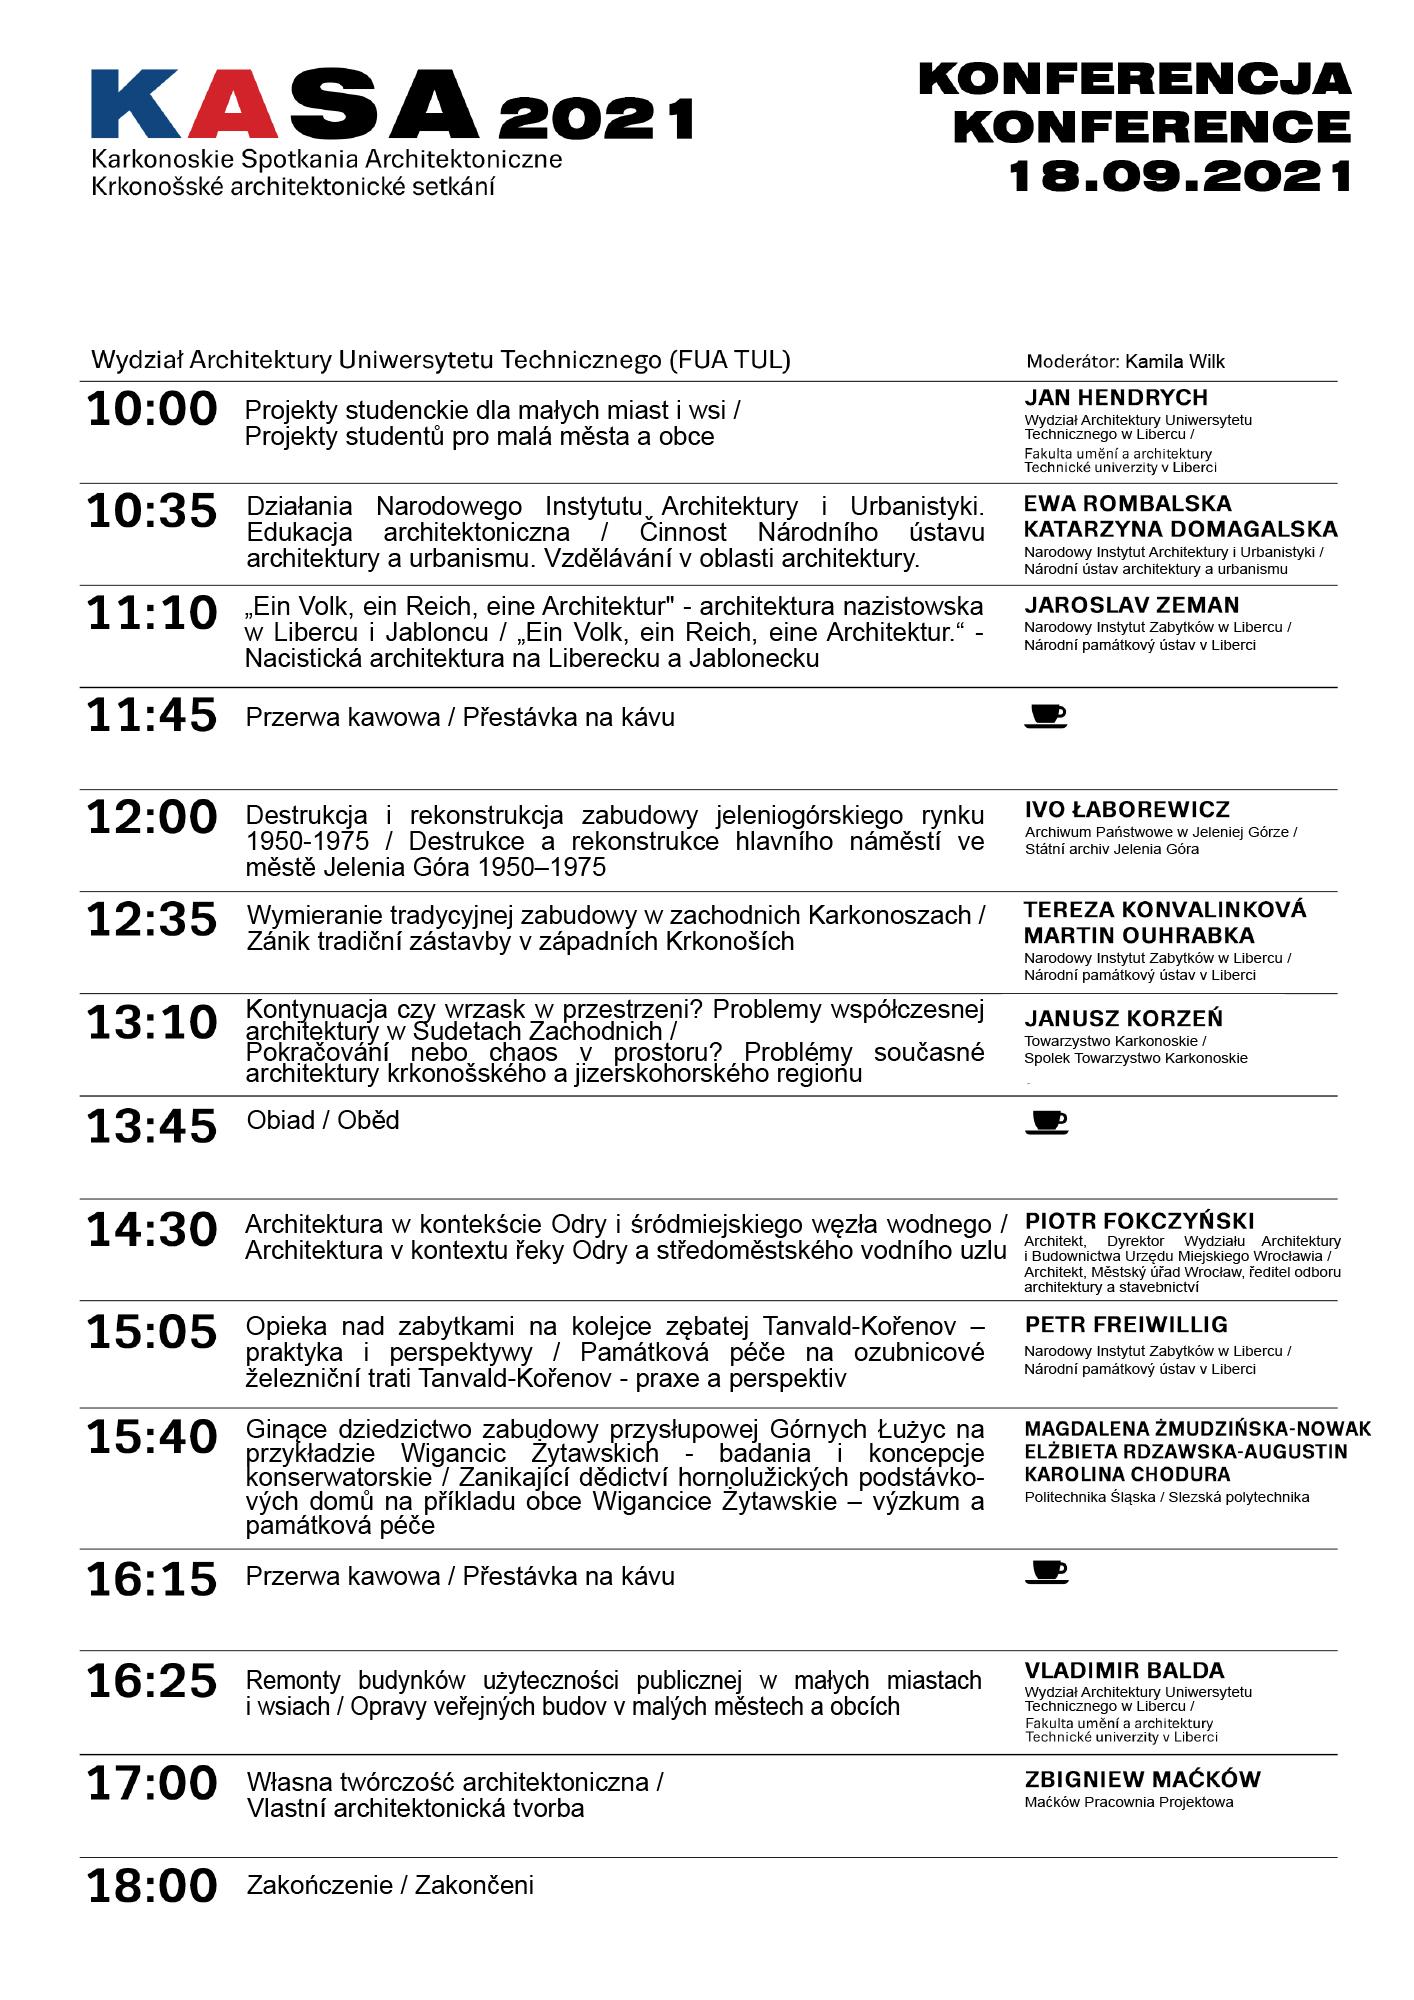 KASA 2021 Program konference